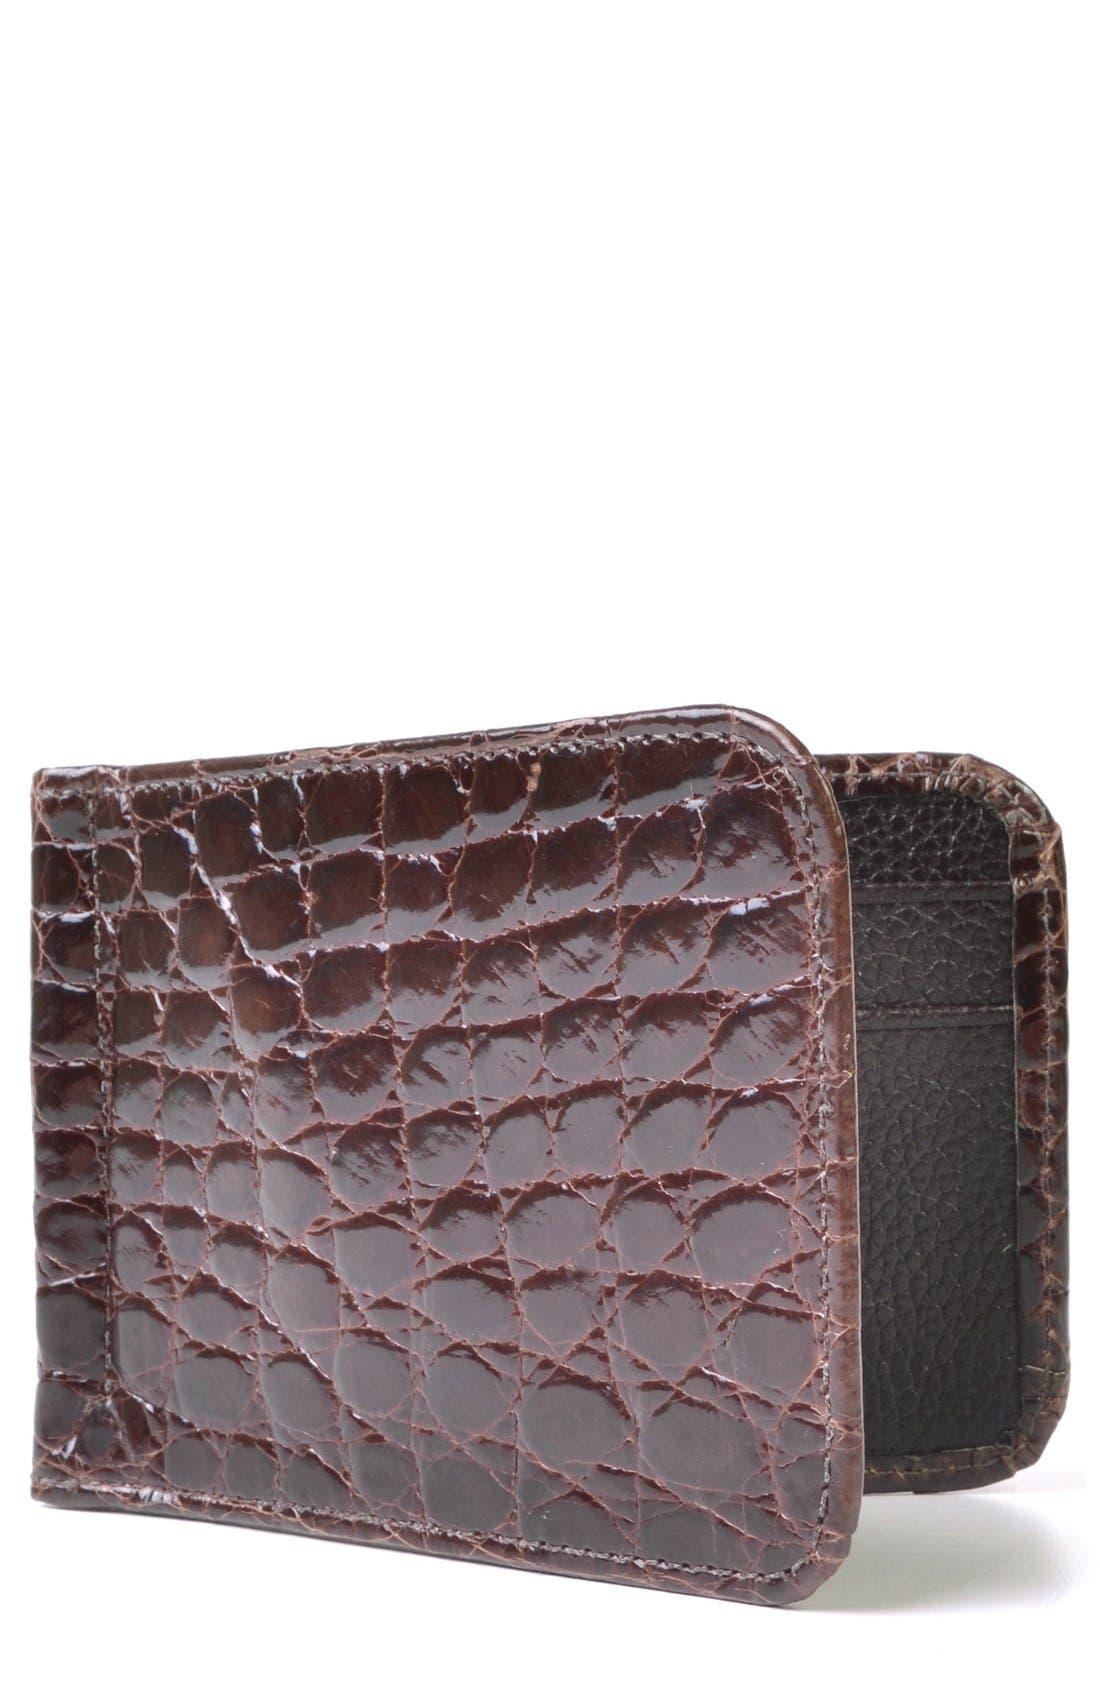 'Joseph' Genuine American Alligator Leather Money Clip Wallet,                         Main,                         color, Brown